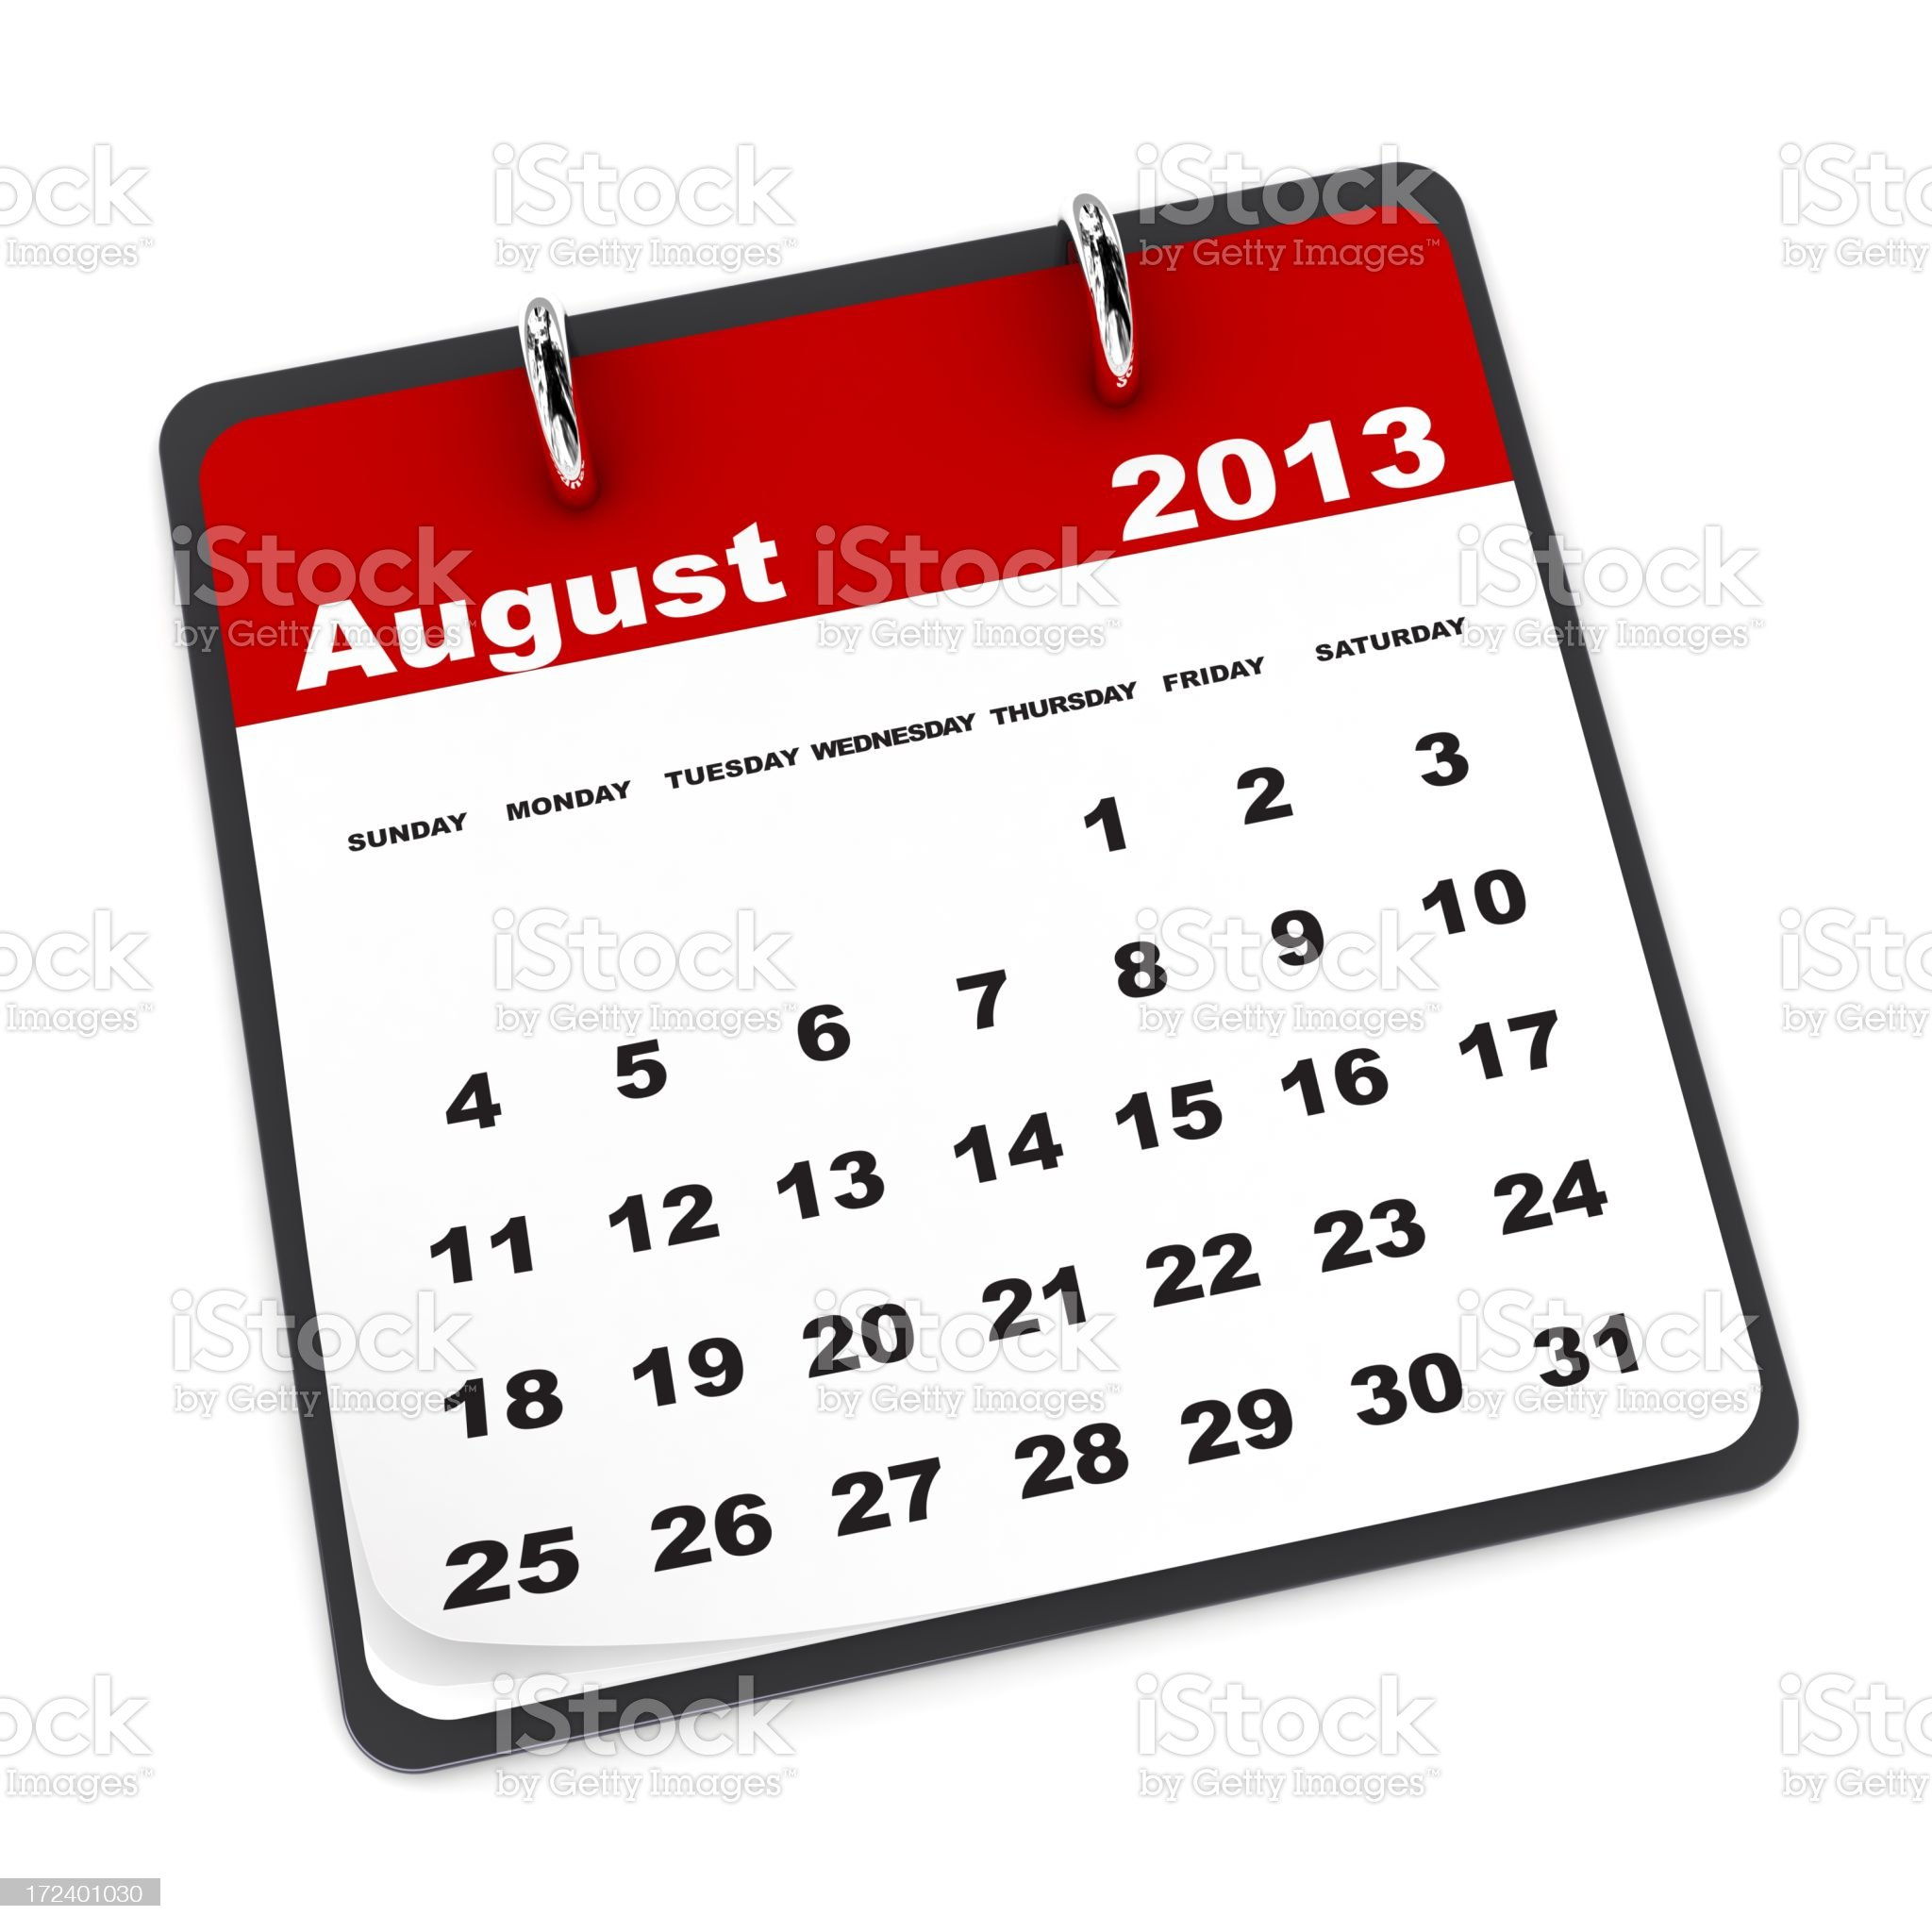 August 2013 - Calendar series royalty-free stock photo